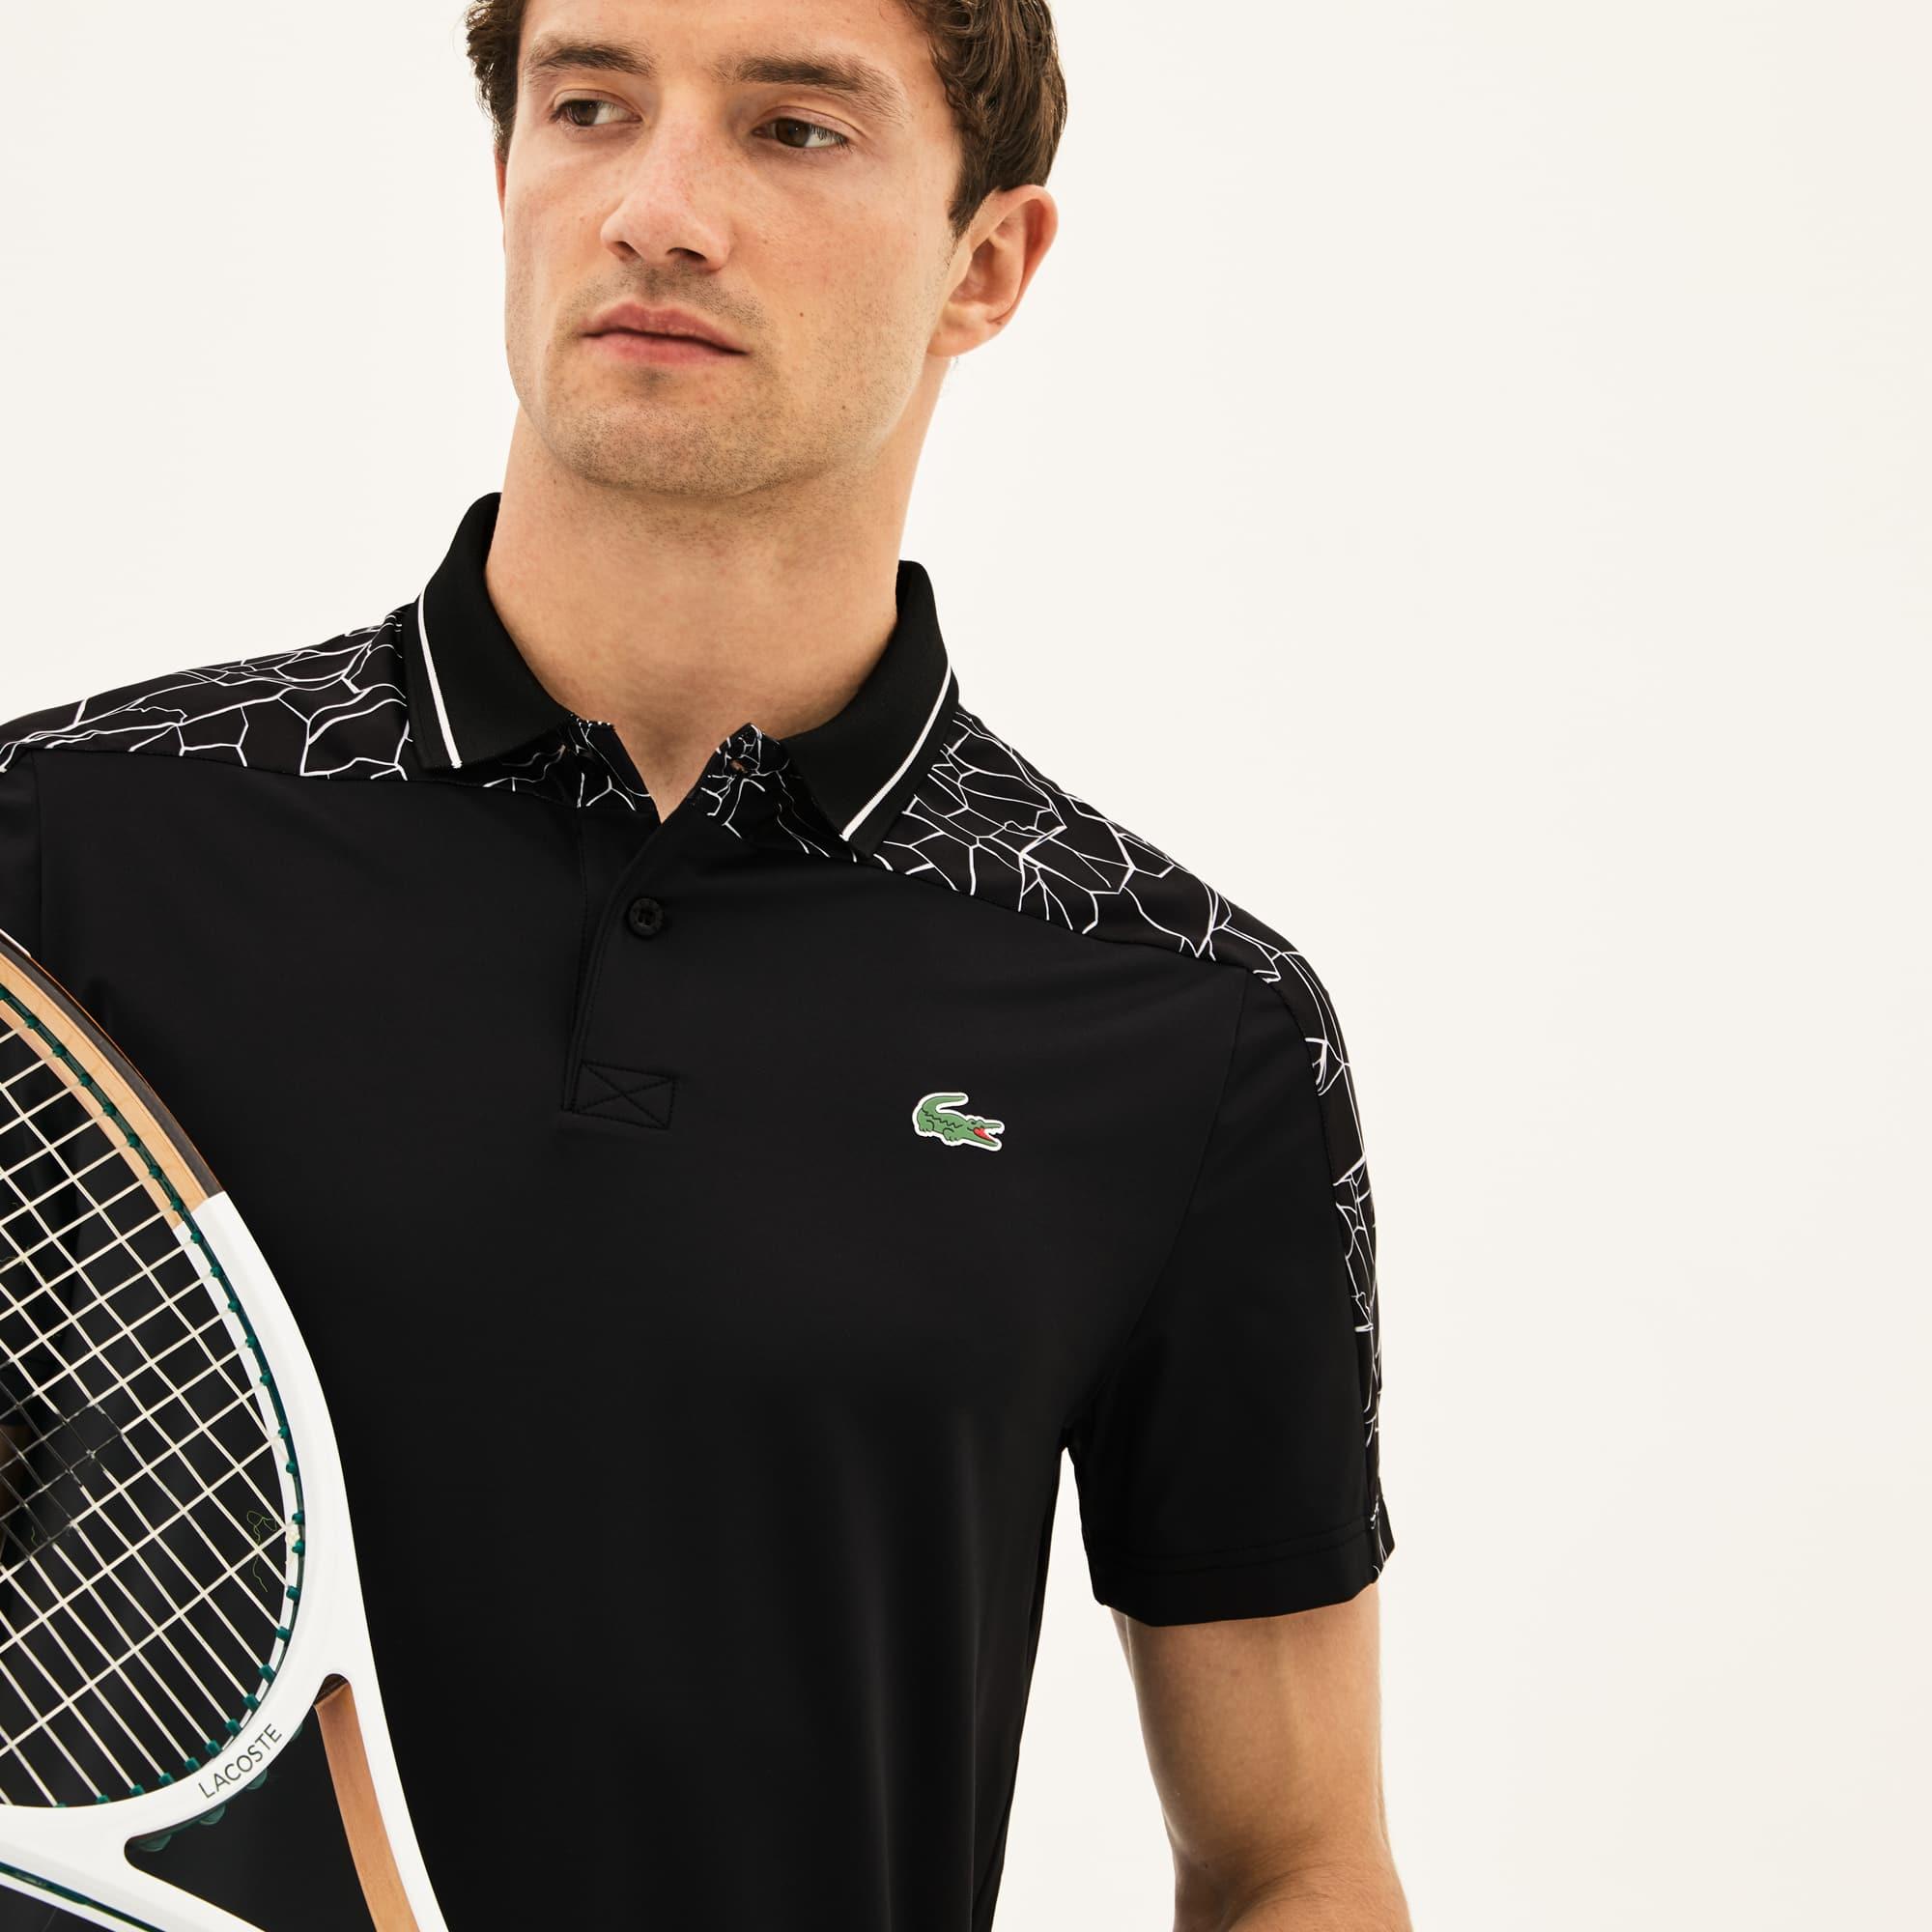 Men's SPORT Stretch Technical Jersey Polo - Lacoste x Novak Djokovic On Court Premium Edition